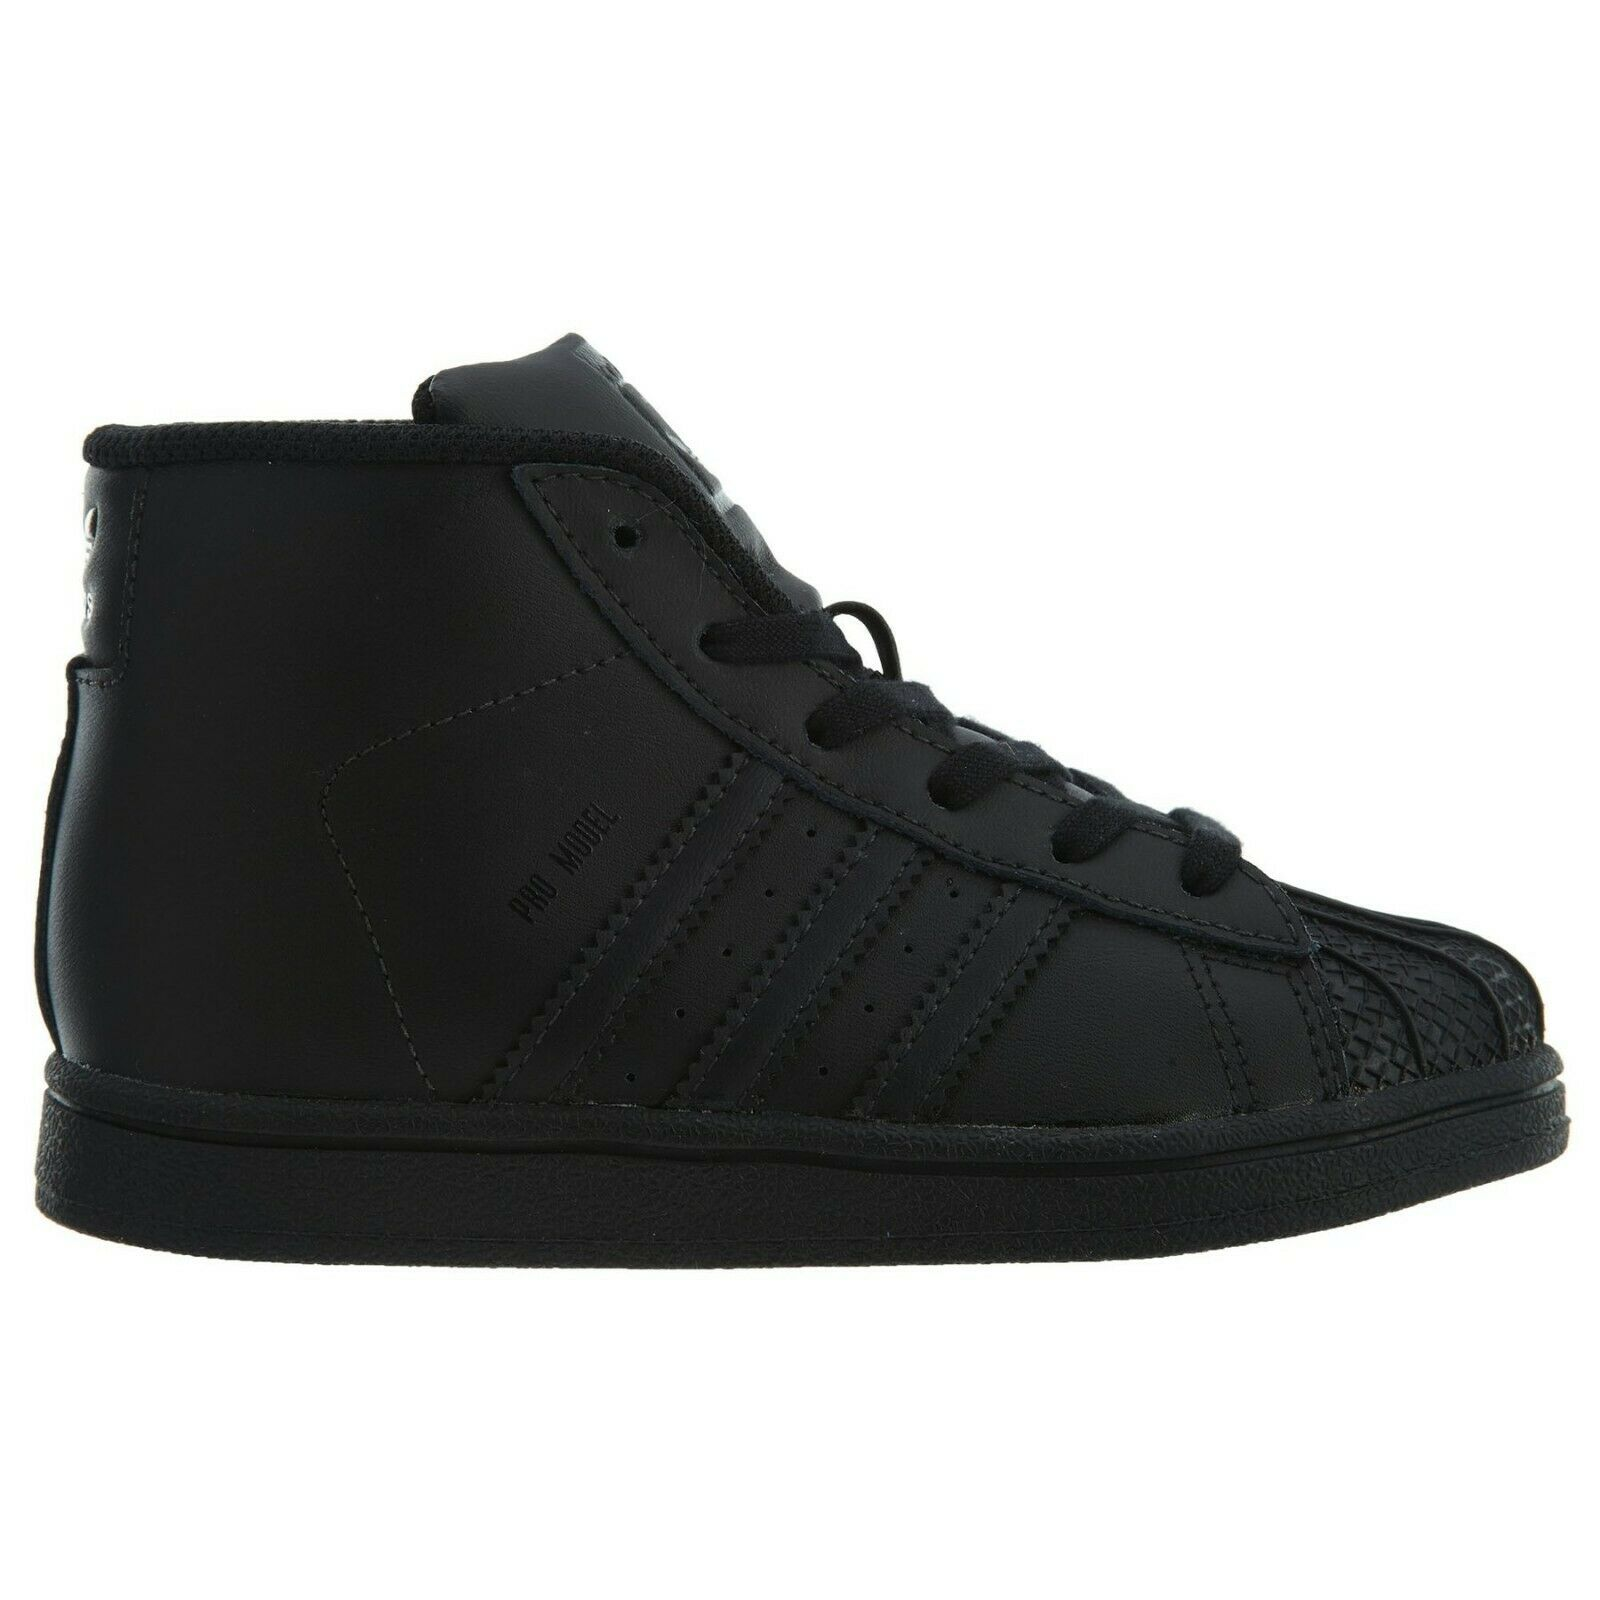 Adidas Originals Infant & Toddlers' PRO MODEL INFANT Shoes Core Black BY4397 b